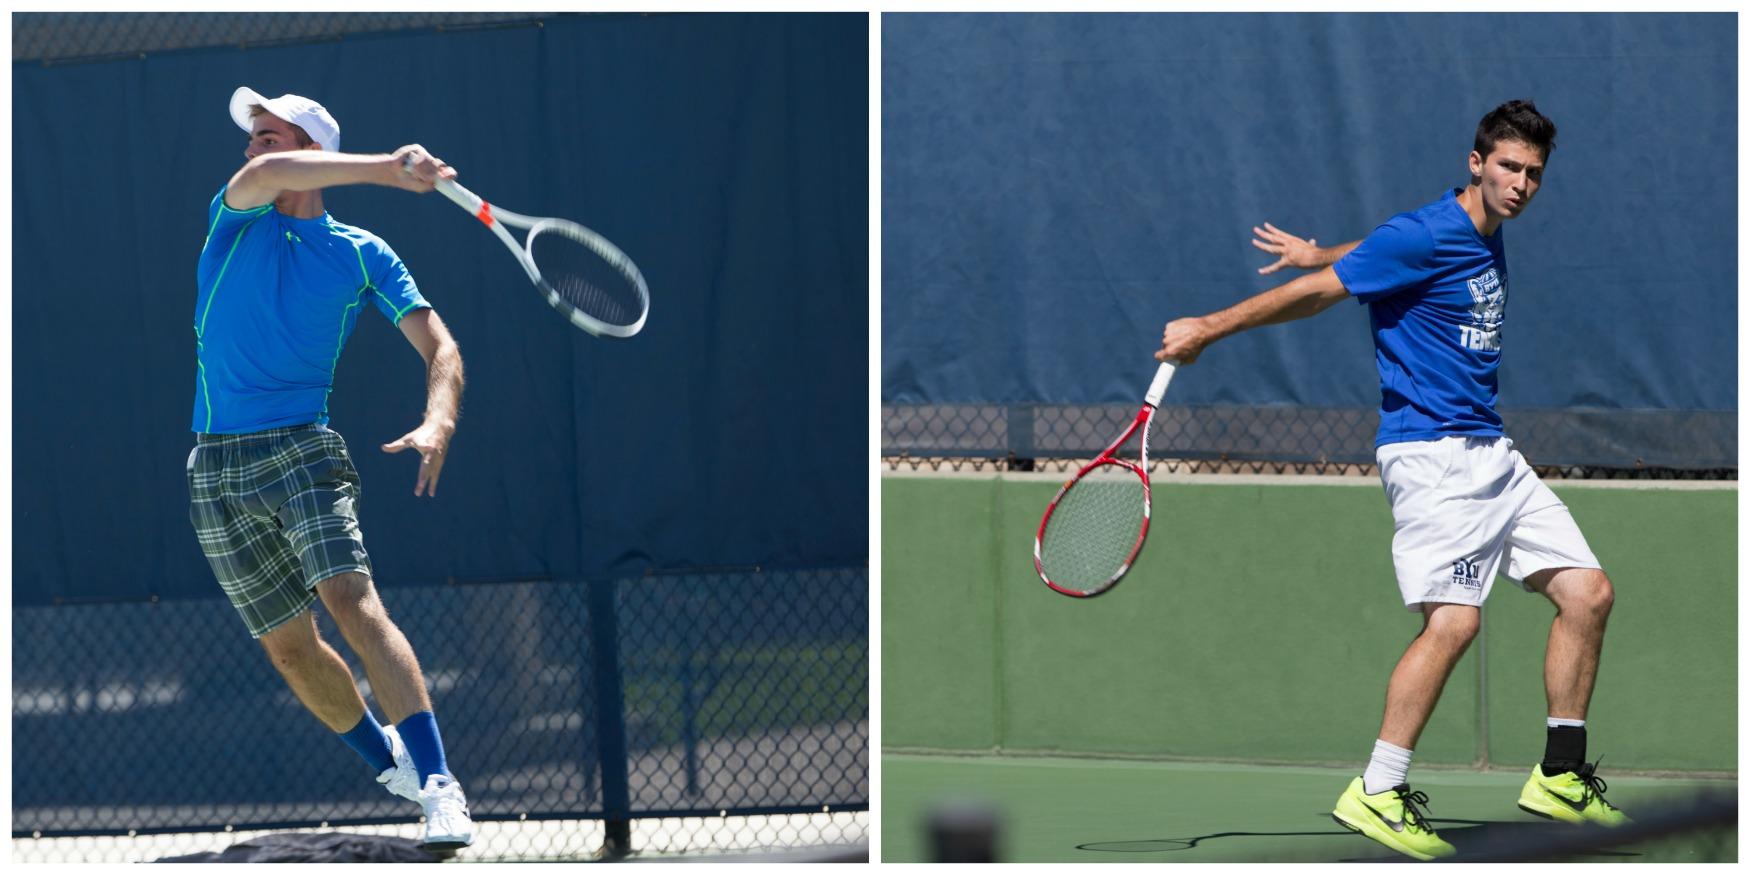 Sam Tullis (left) and Matt Pearce (right) competing in the Fall Tennis Classic. (Gian Luca Cuestas)